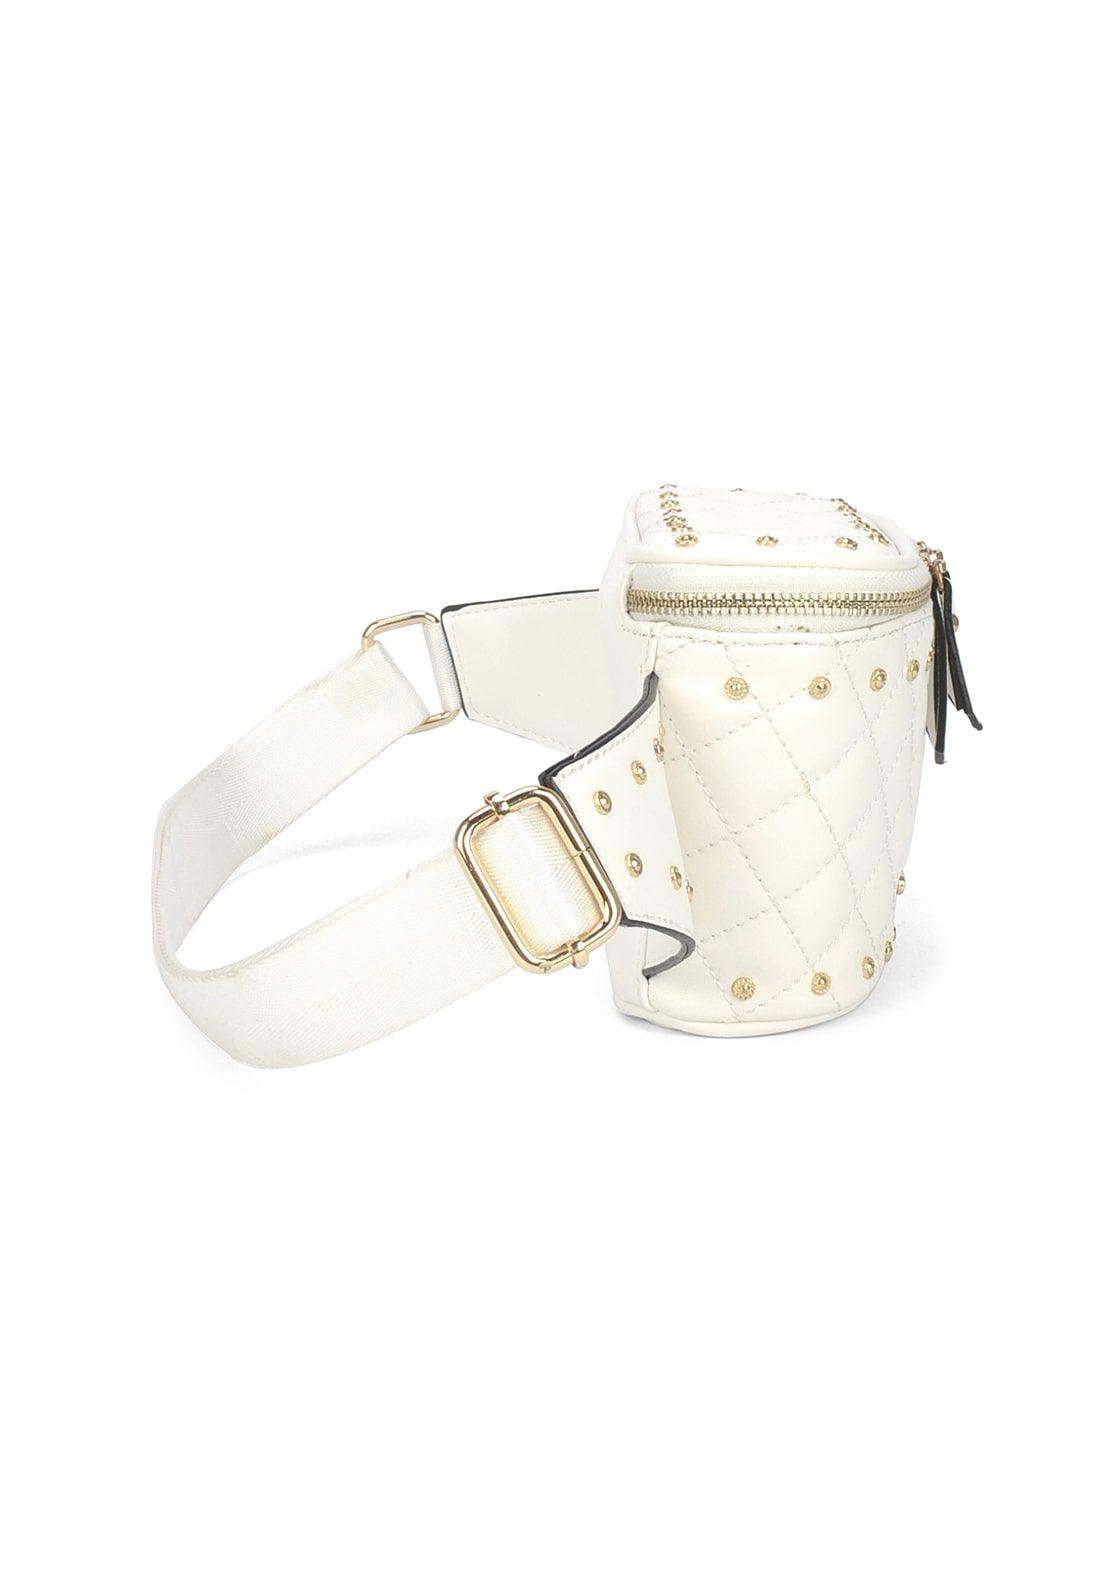 Bolsa Pochete Feminina Up4you Matelassê Off White Original